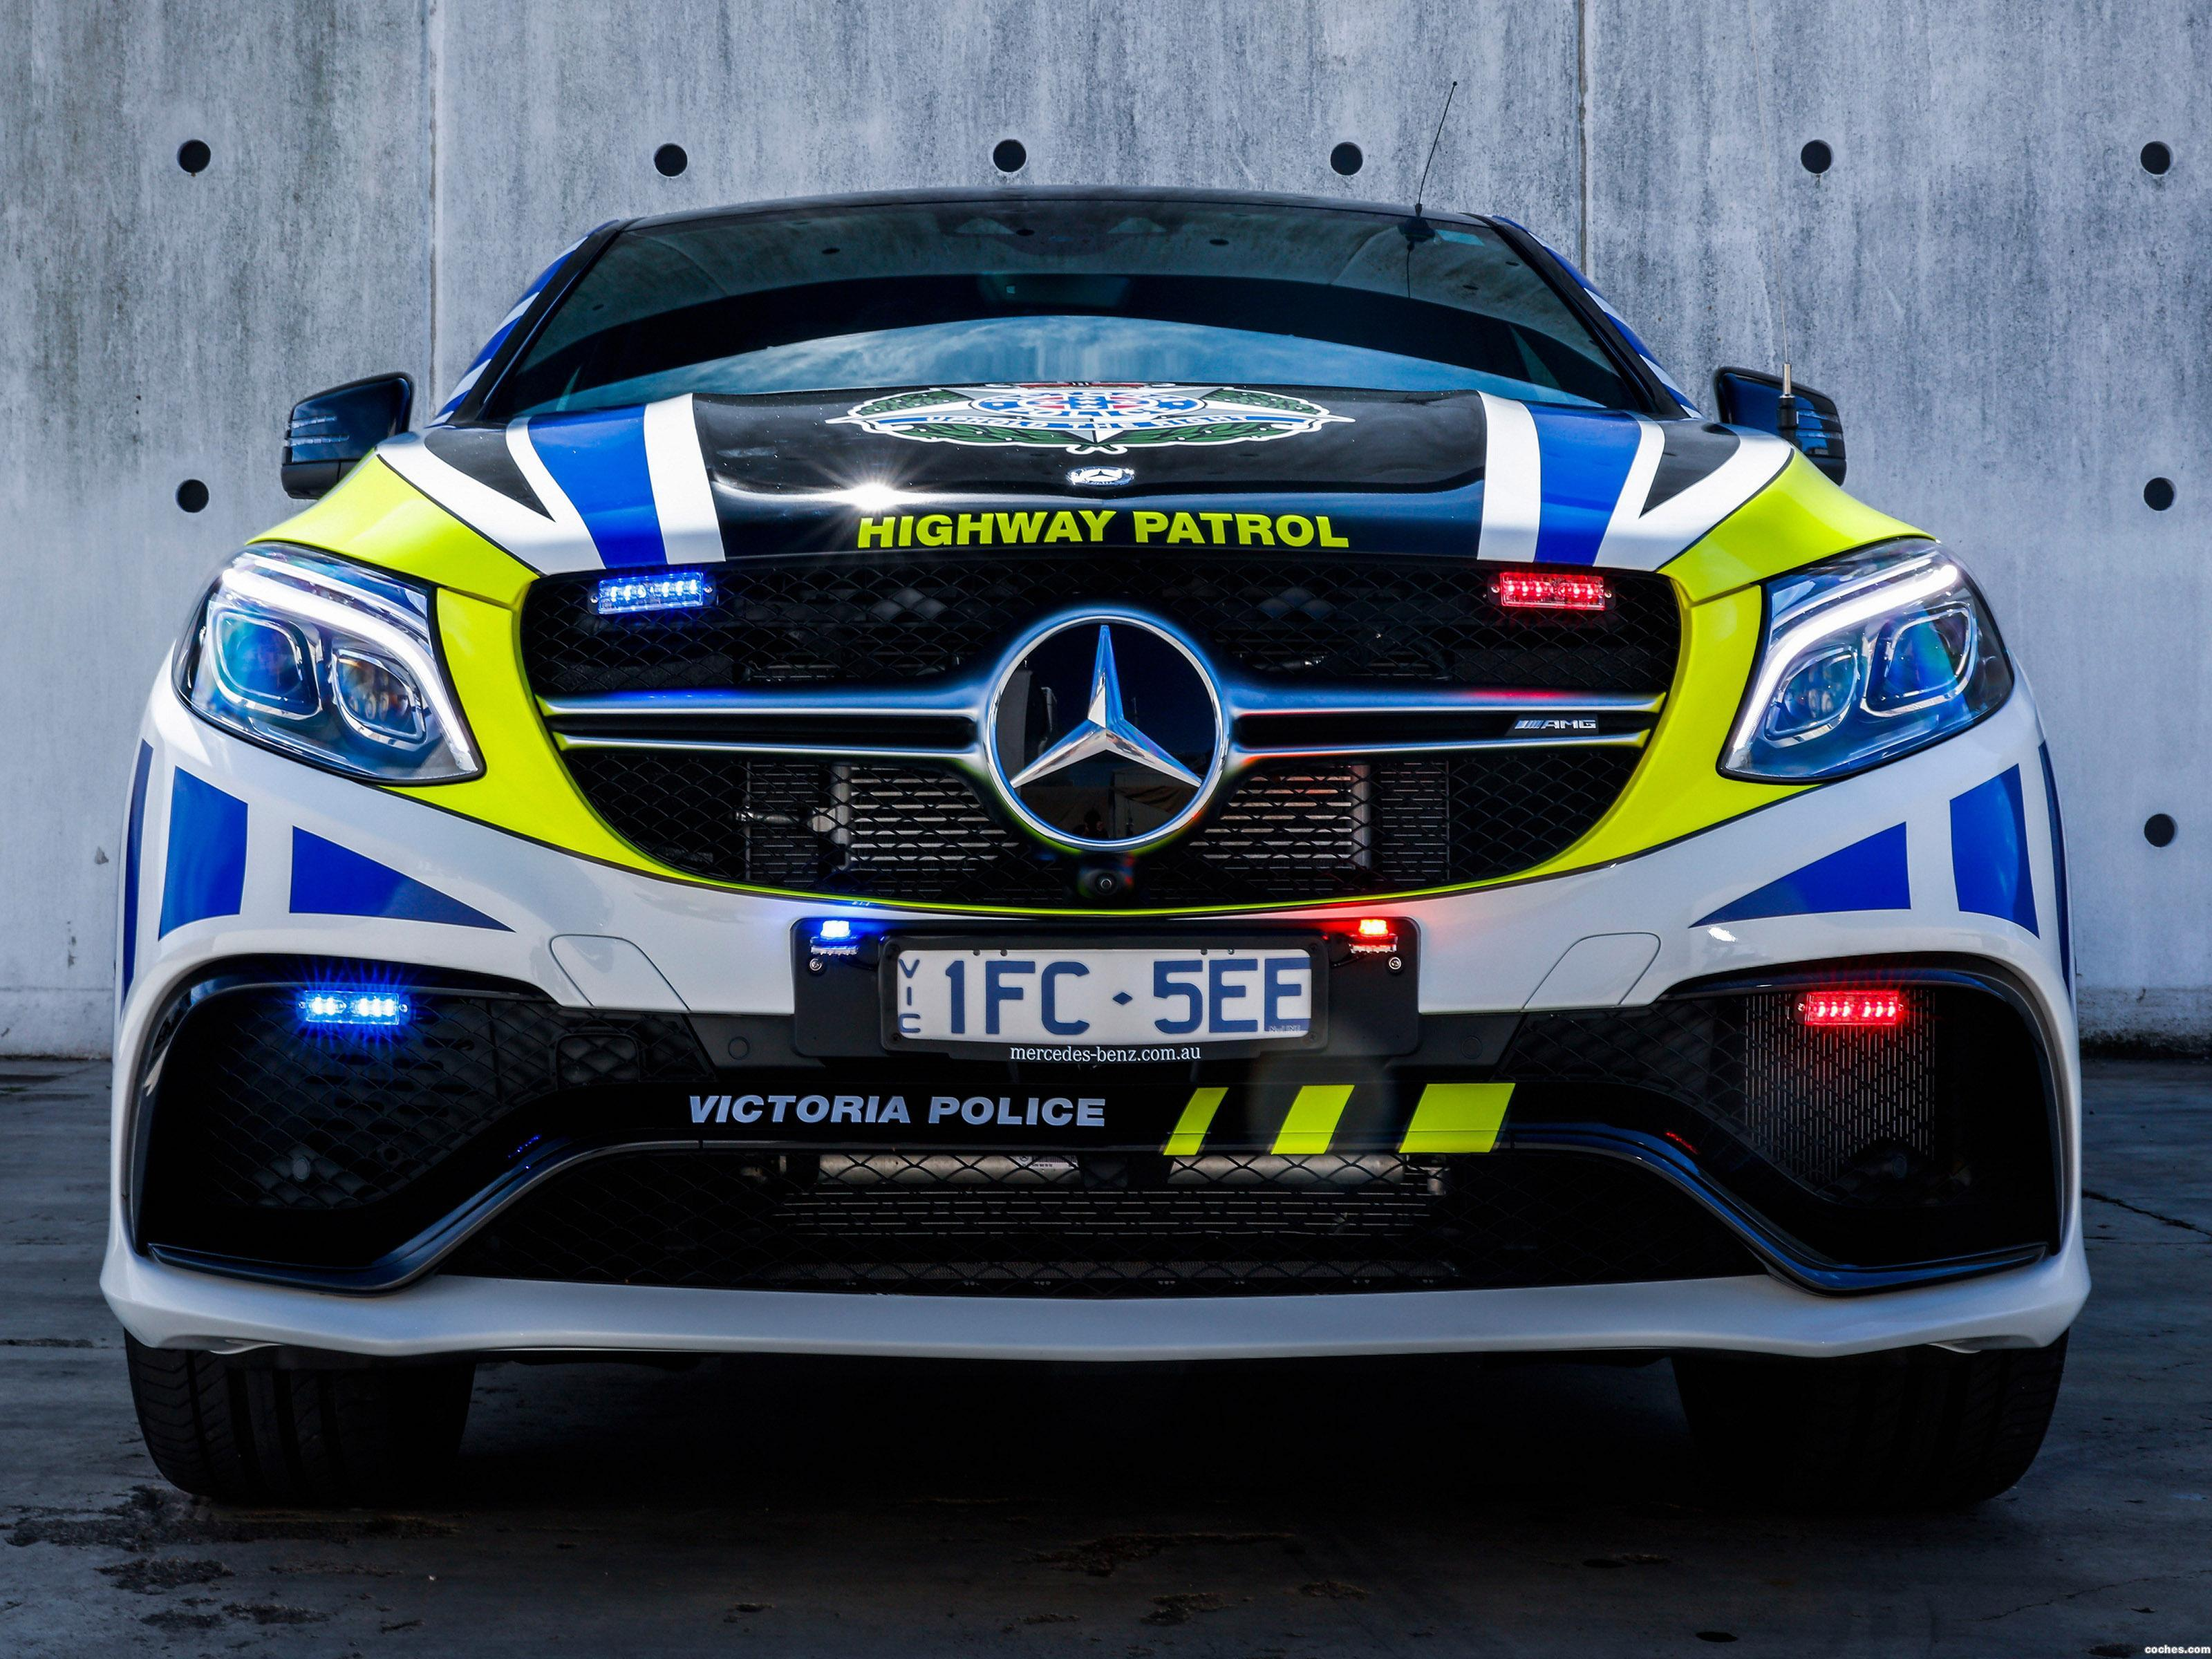 amg_mercedes-gle-63-police-car-australia-2016_r4.jpg